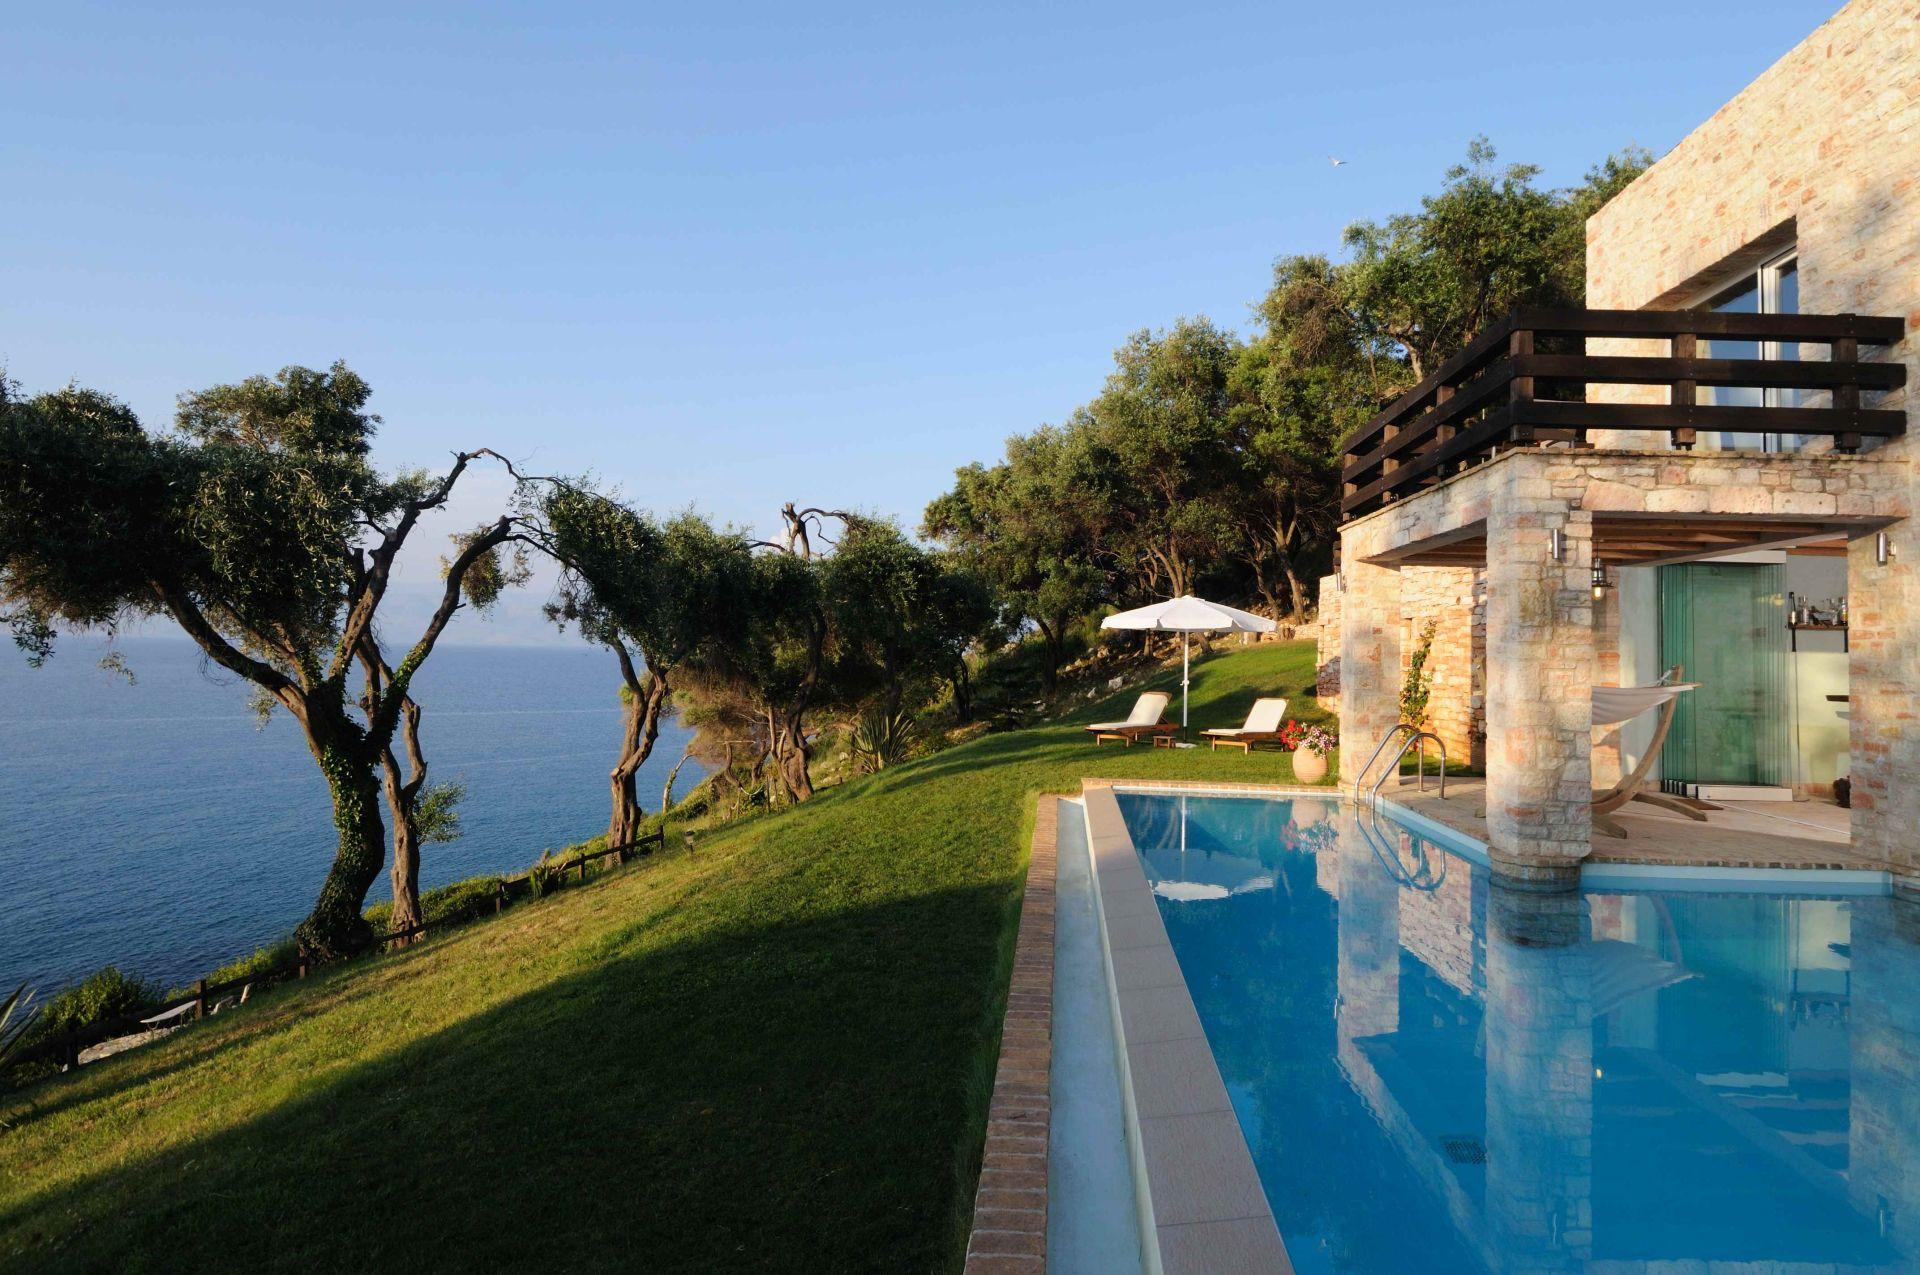 Pool - Korfu Villa Steilküste, Agios Spiridon, Korfu, Griechenland